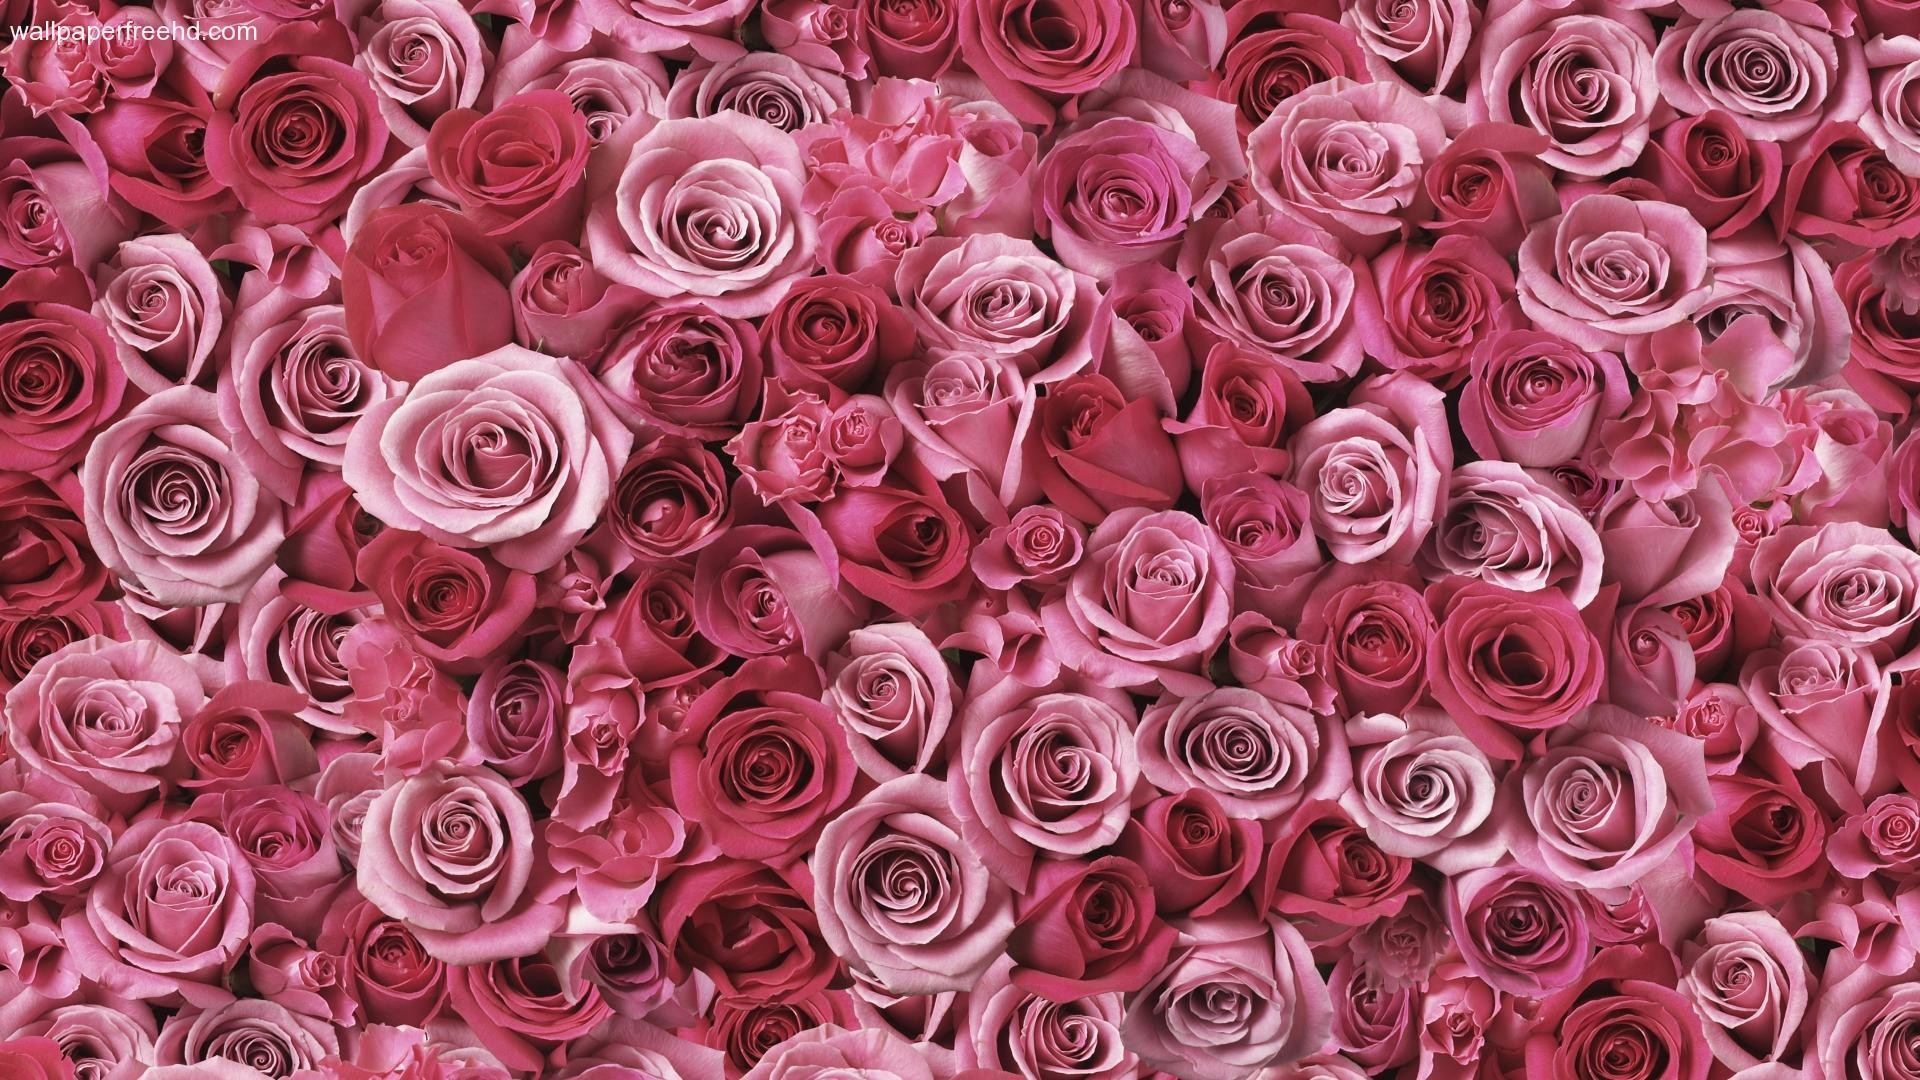 Pink Roses Wallpaper HD   Free Download Wallpaper Desktop Backgrounds